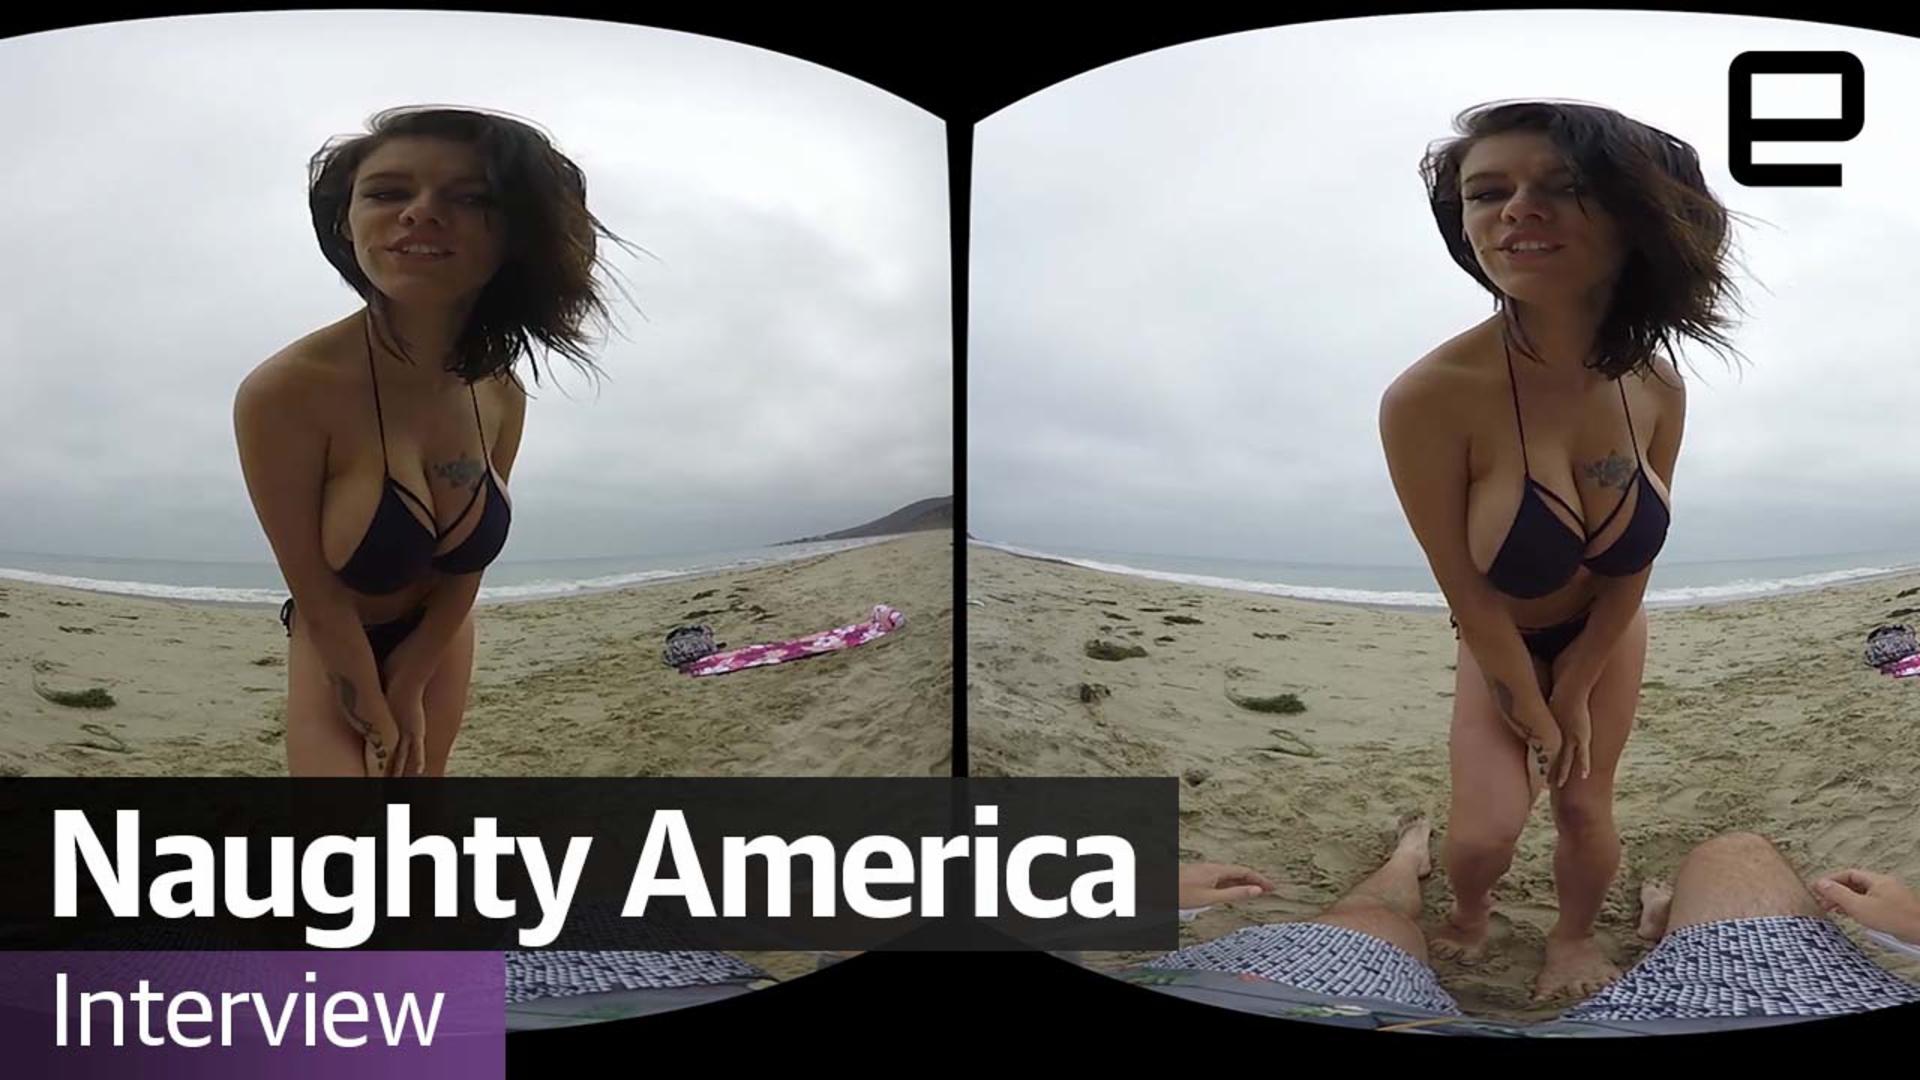 naughty america. com